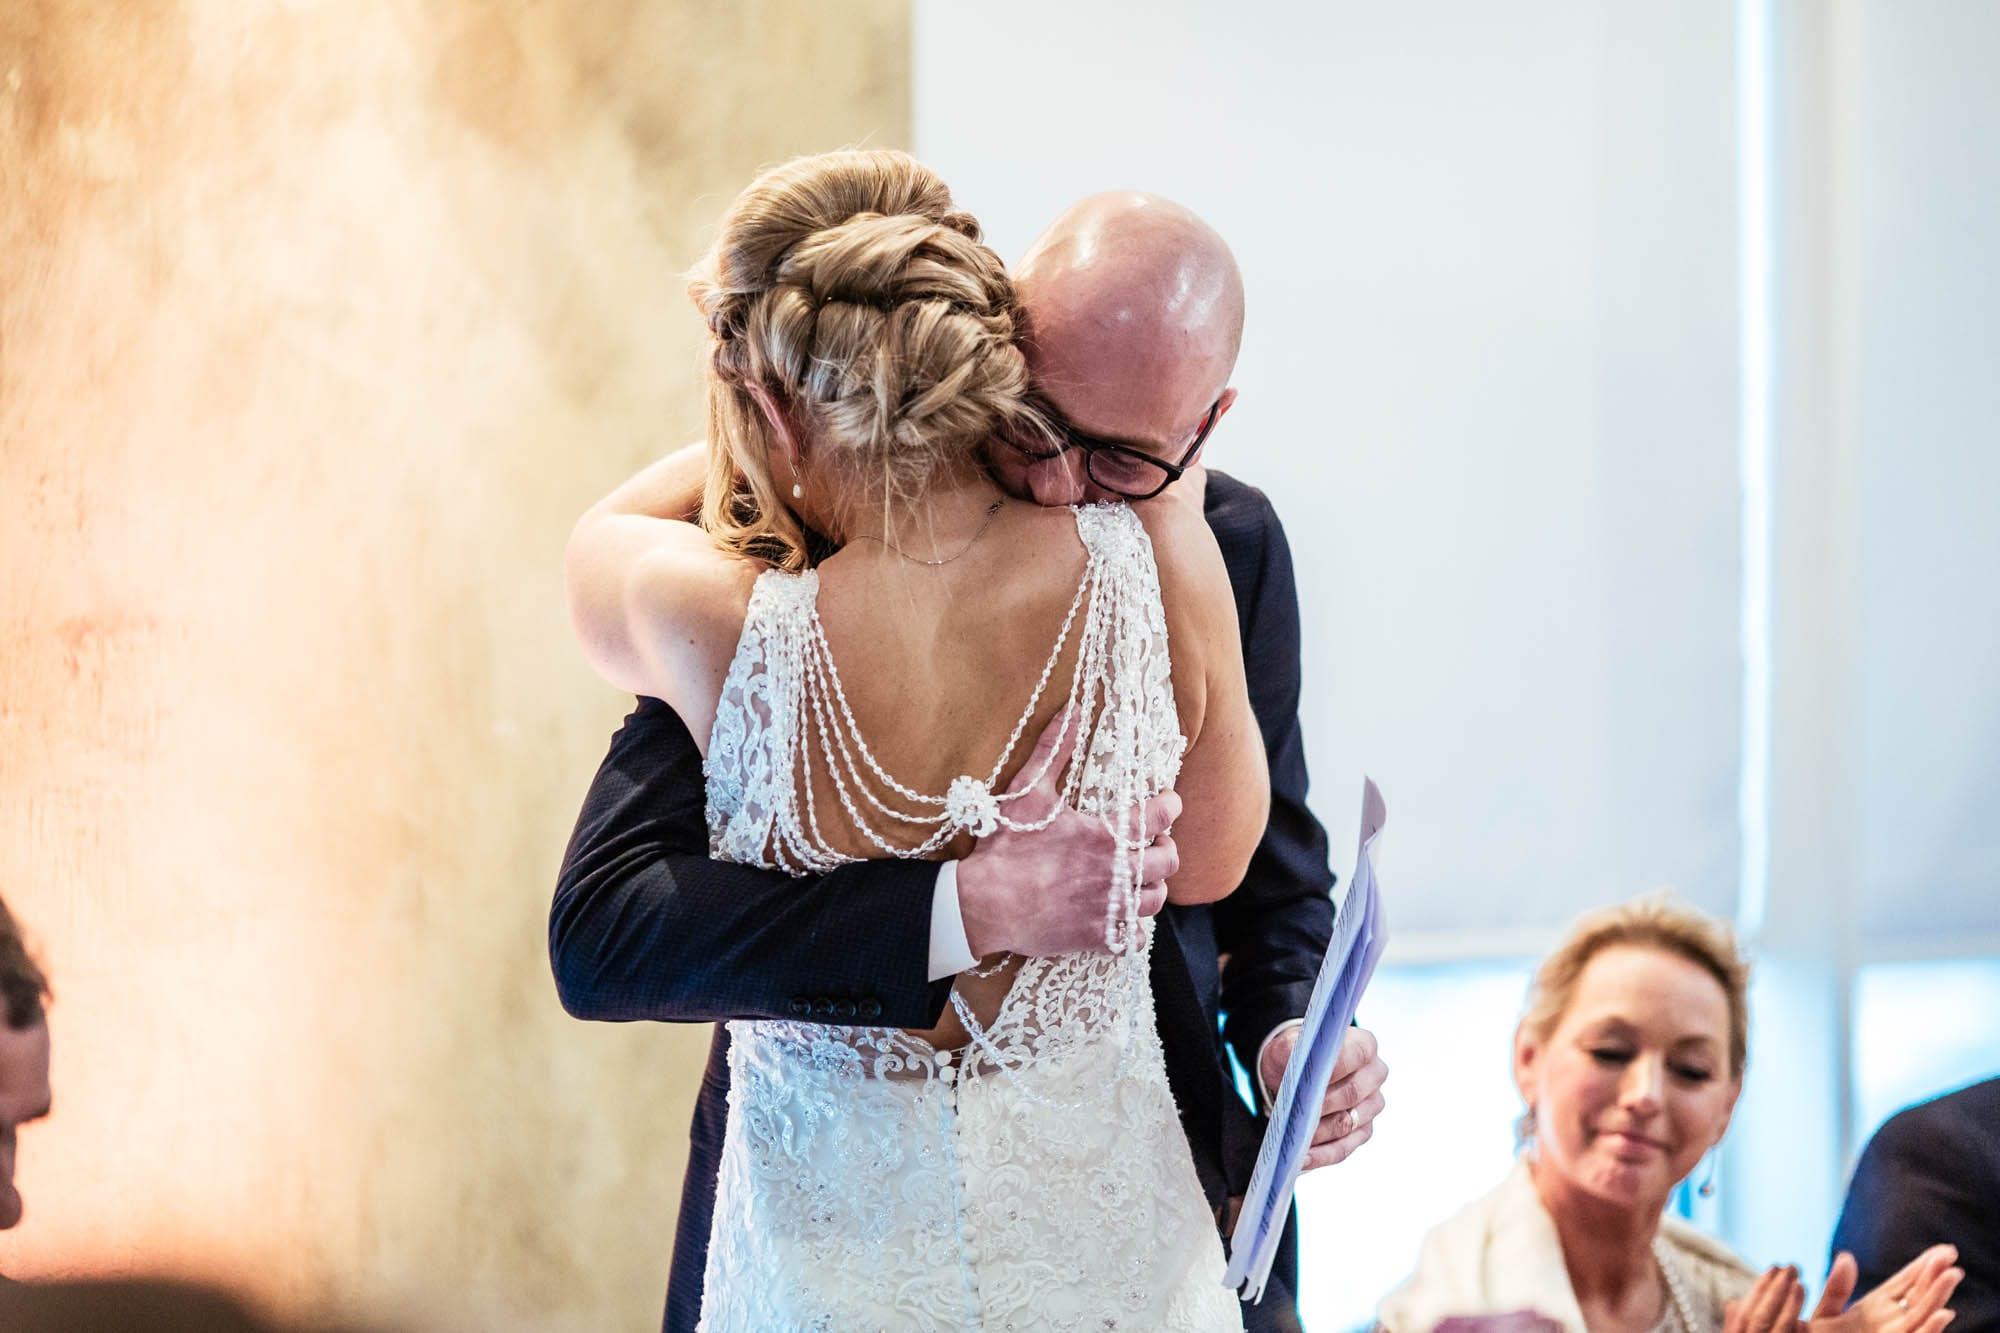 Wedding Reception On the 7th